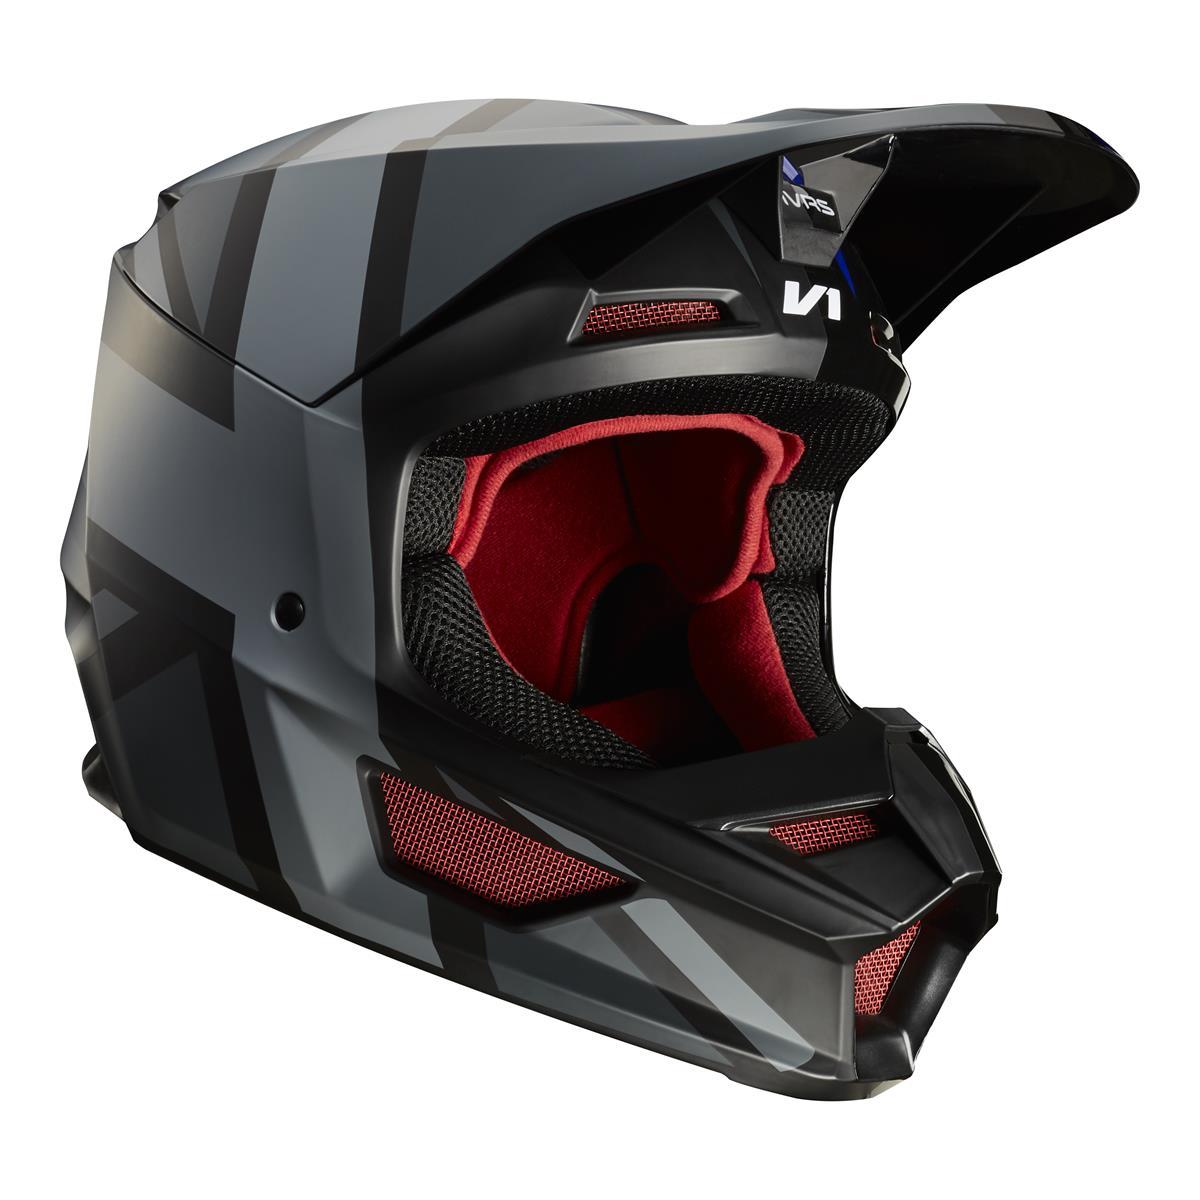 Fox Helm V1 Rot/Schwarz - Special Edition MXON